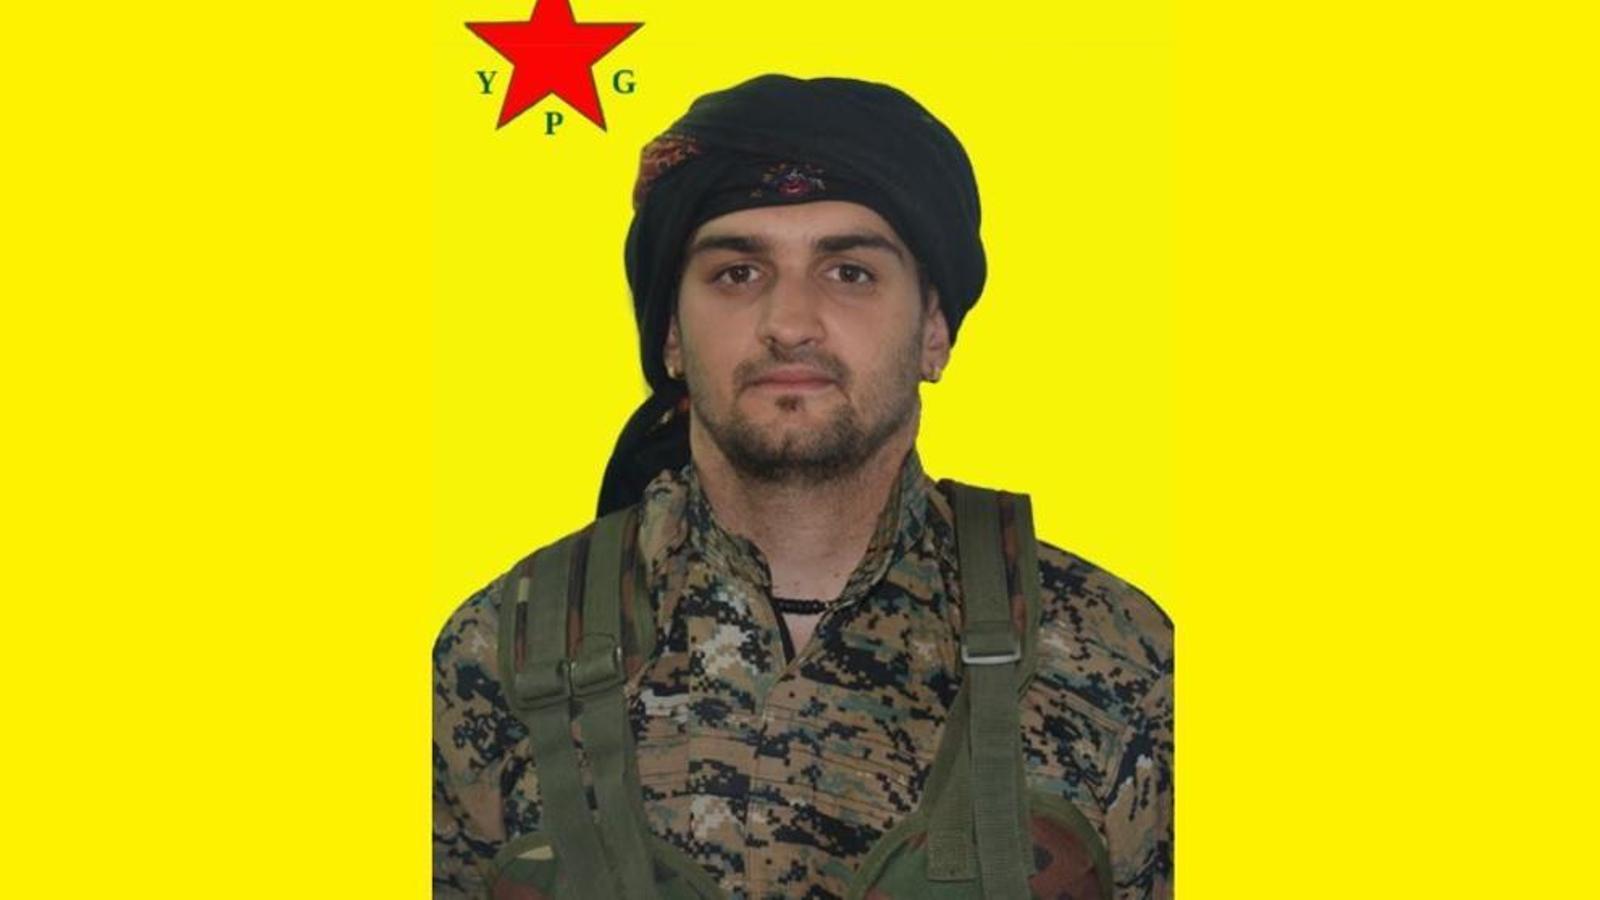 S.P.L. / YPG